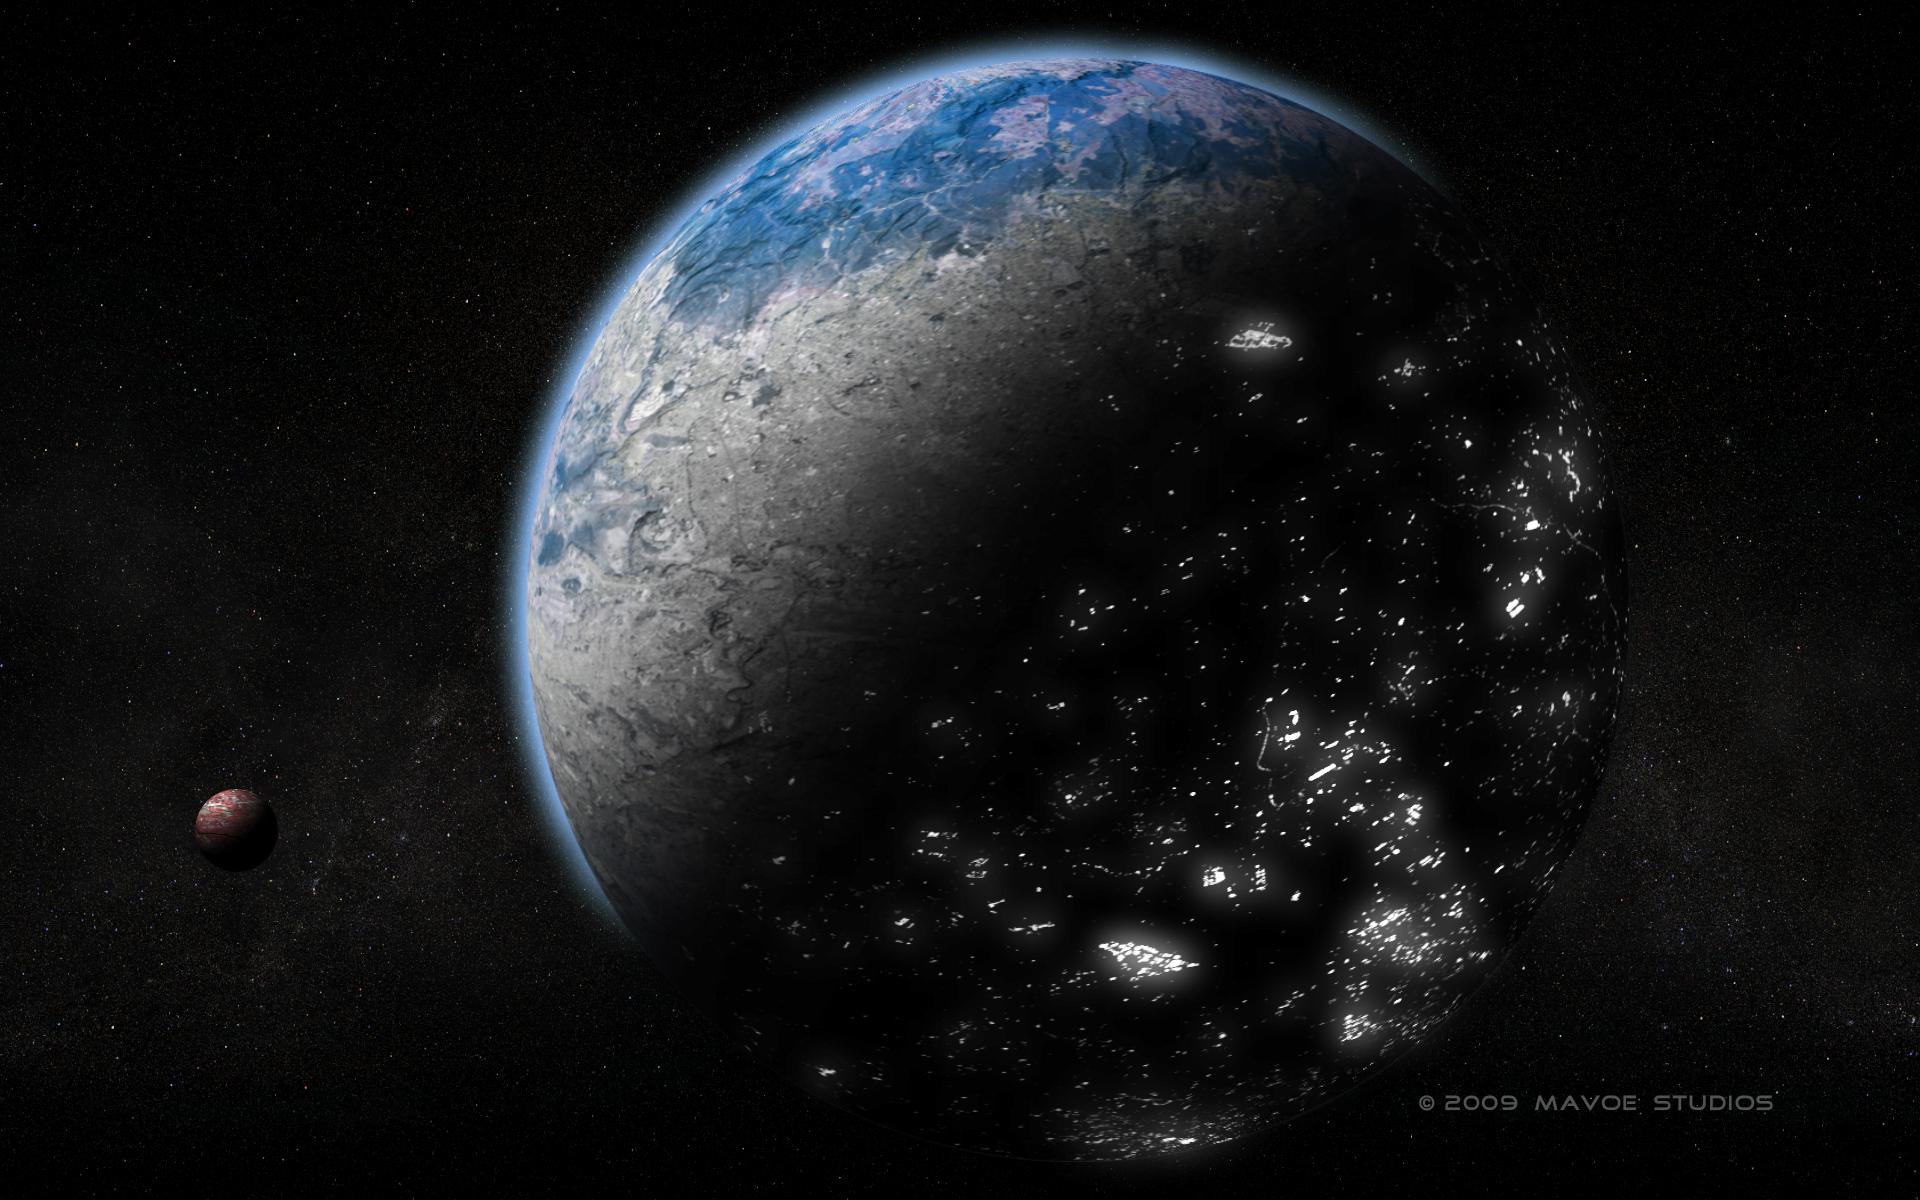 [010;0F] Midas II system Ws_Alien_planet_1920x1200